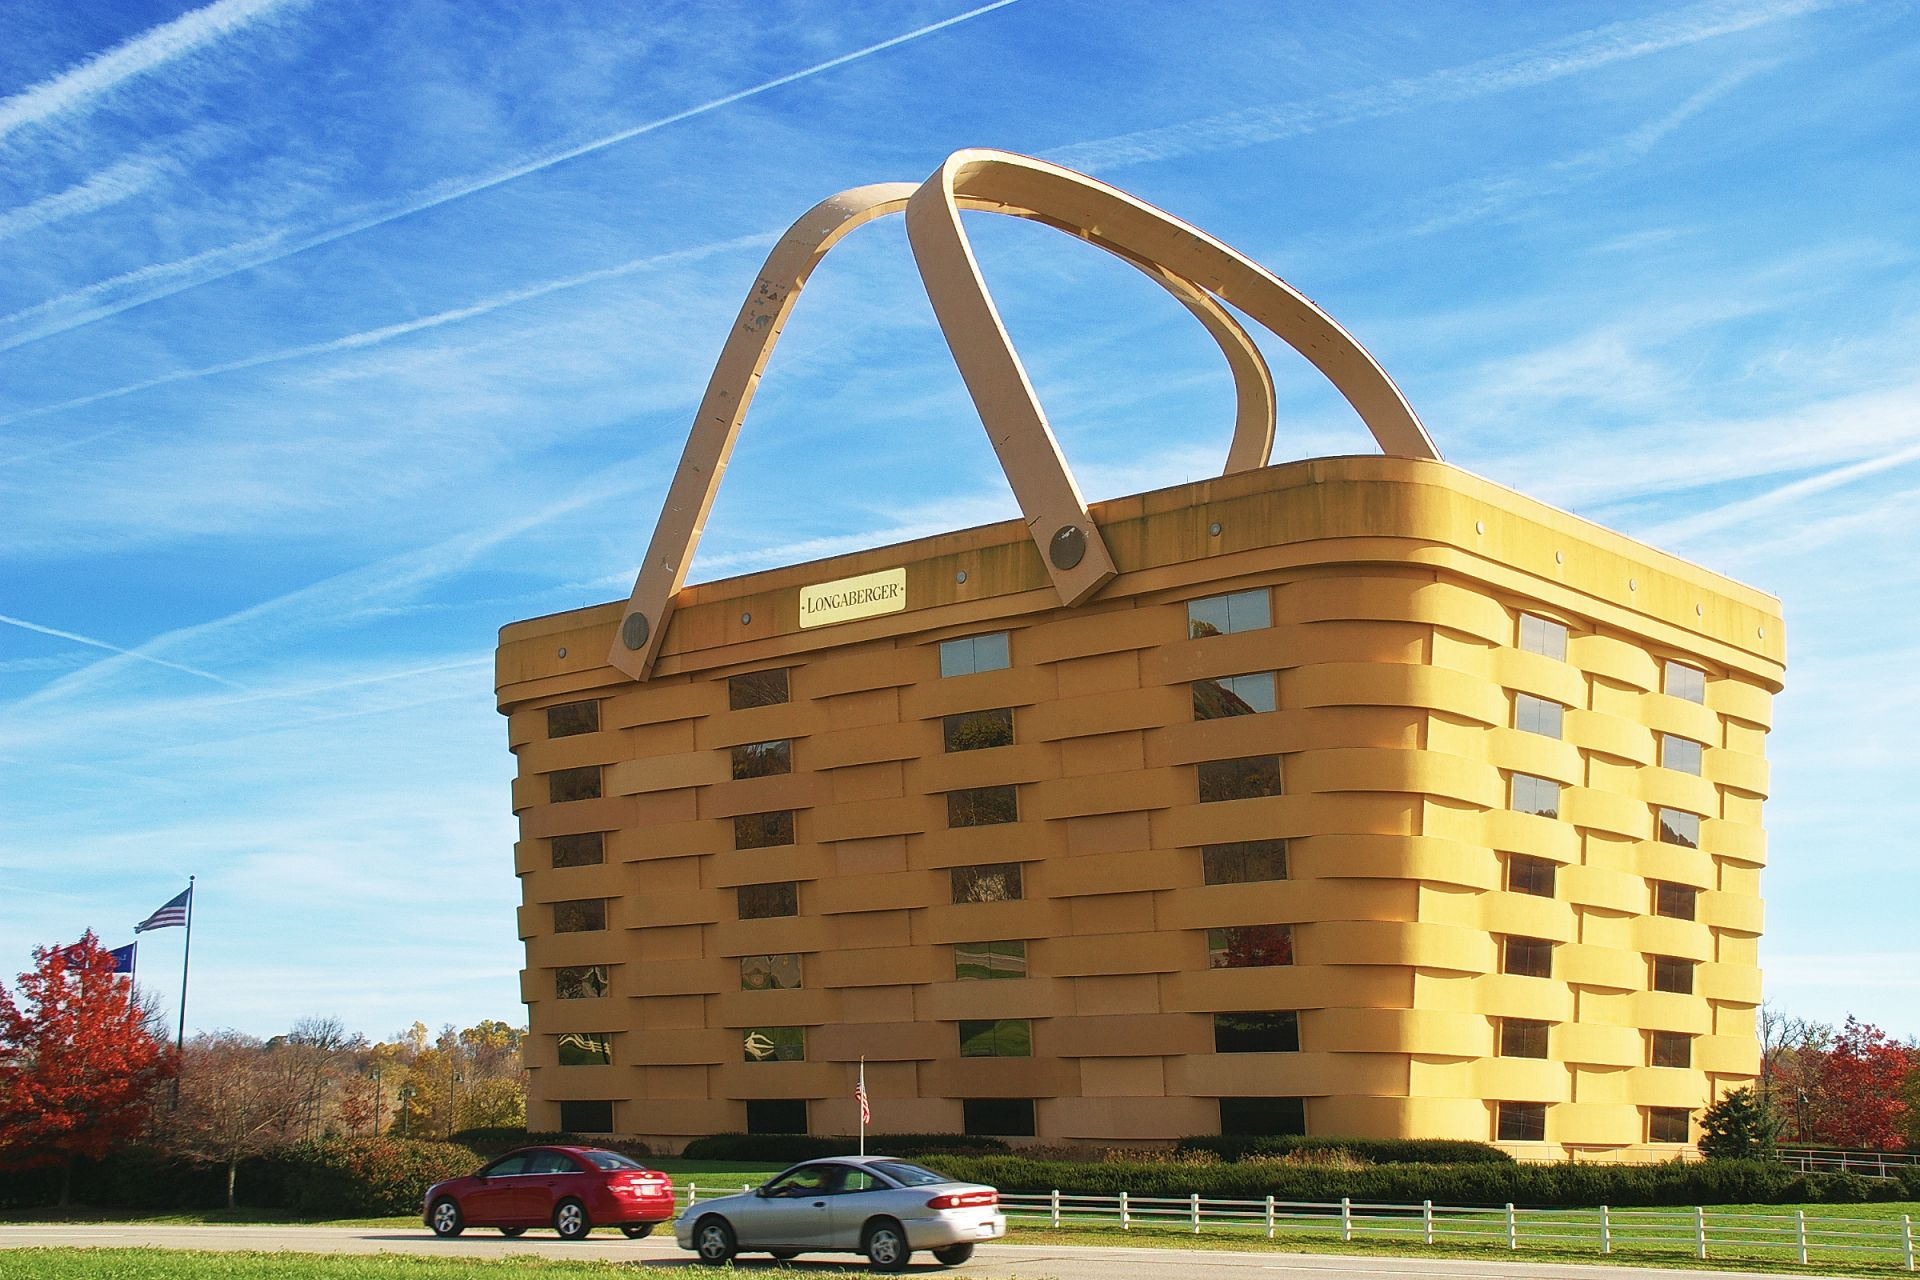 Longaberger Basket Building   Modlar.com